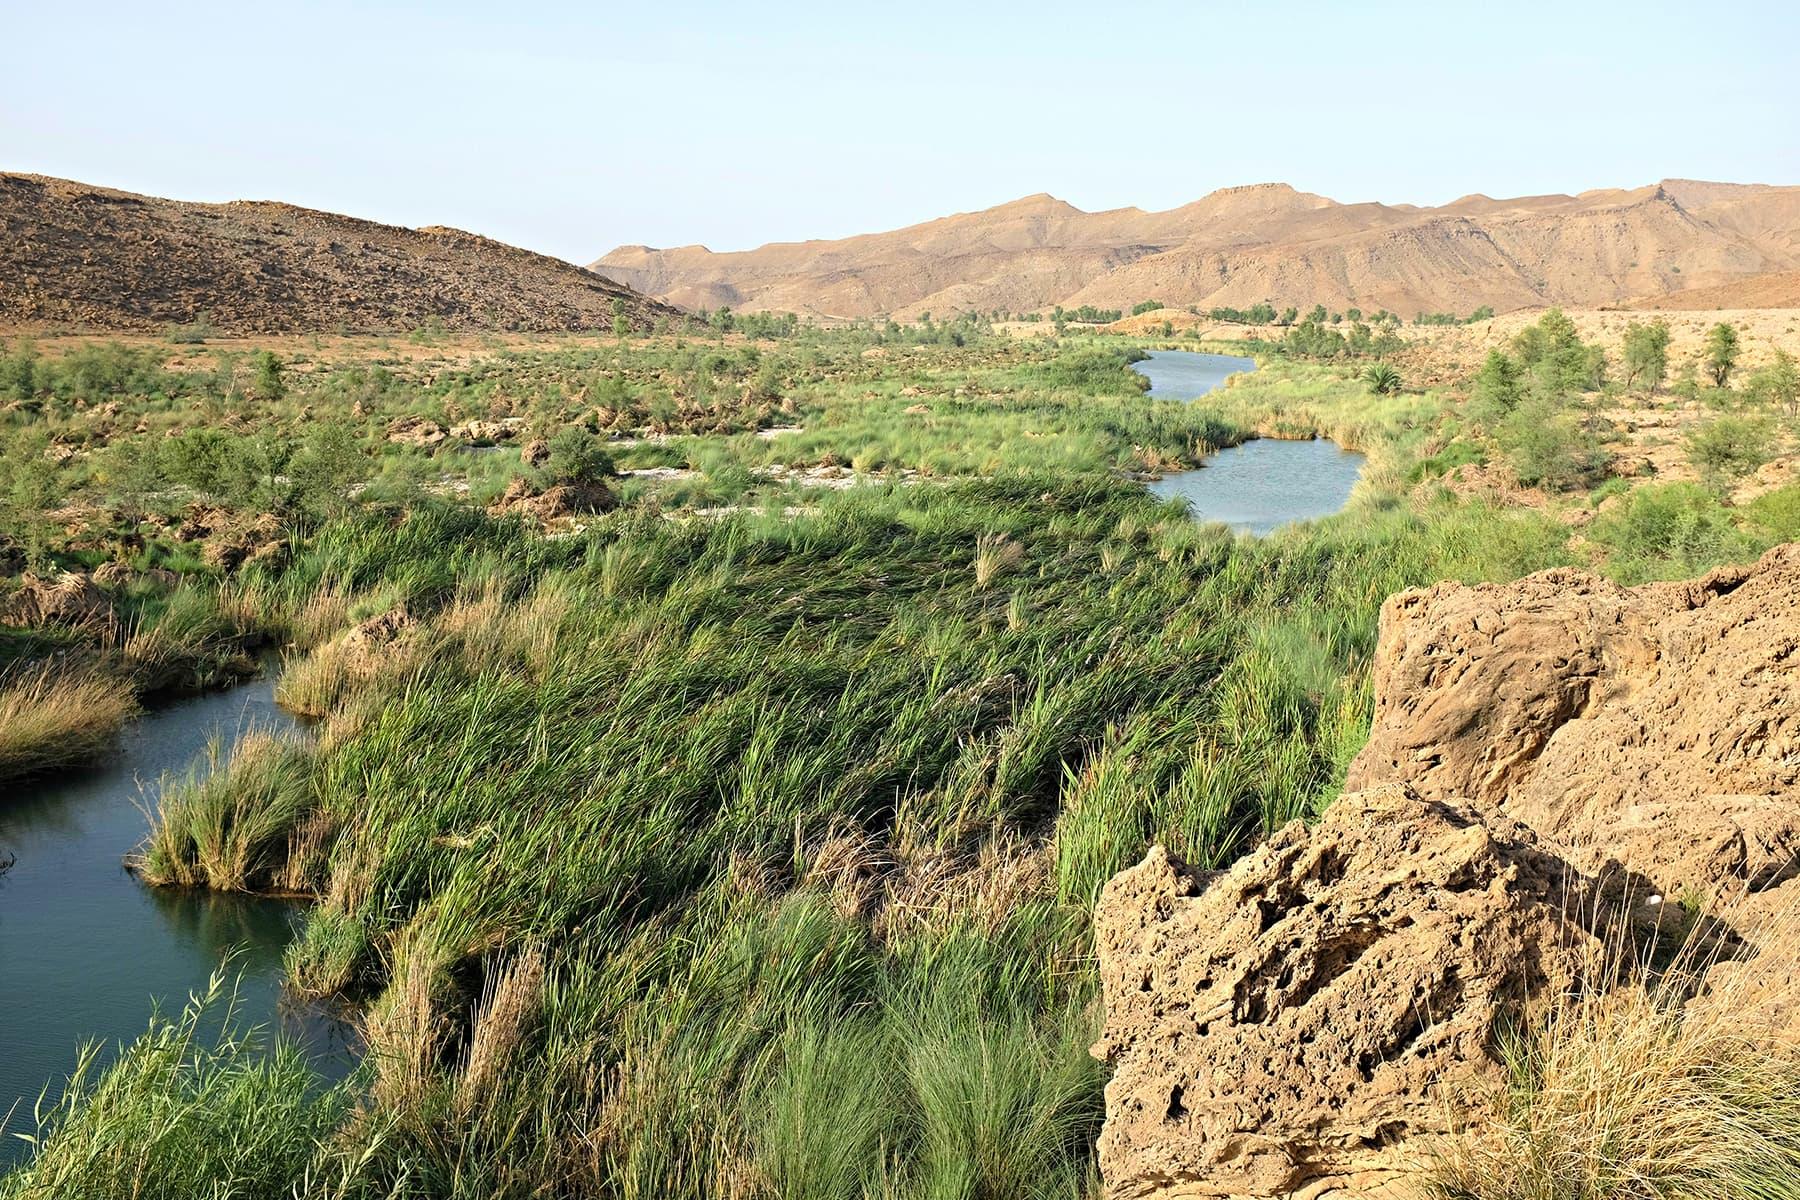 A view of the area around Peeplasar.